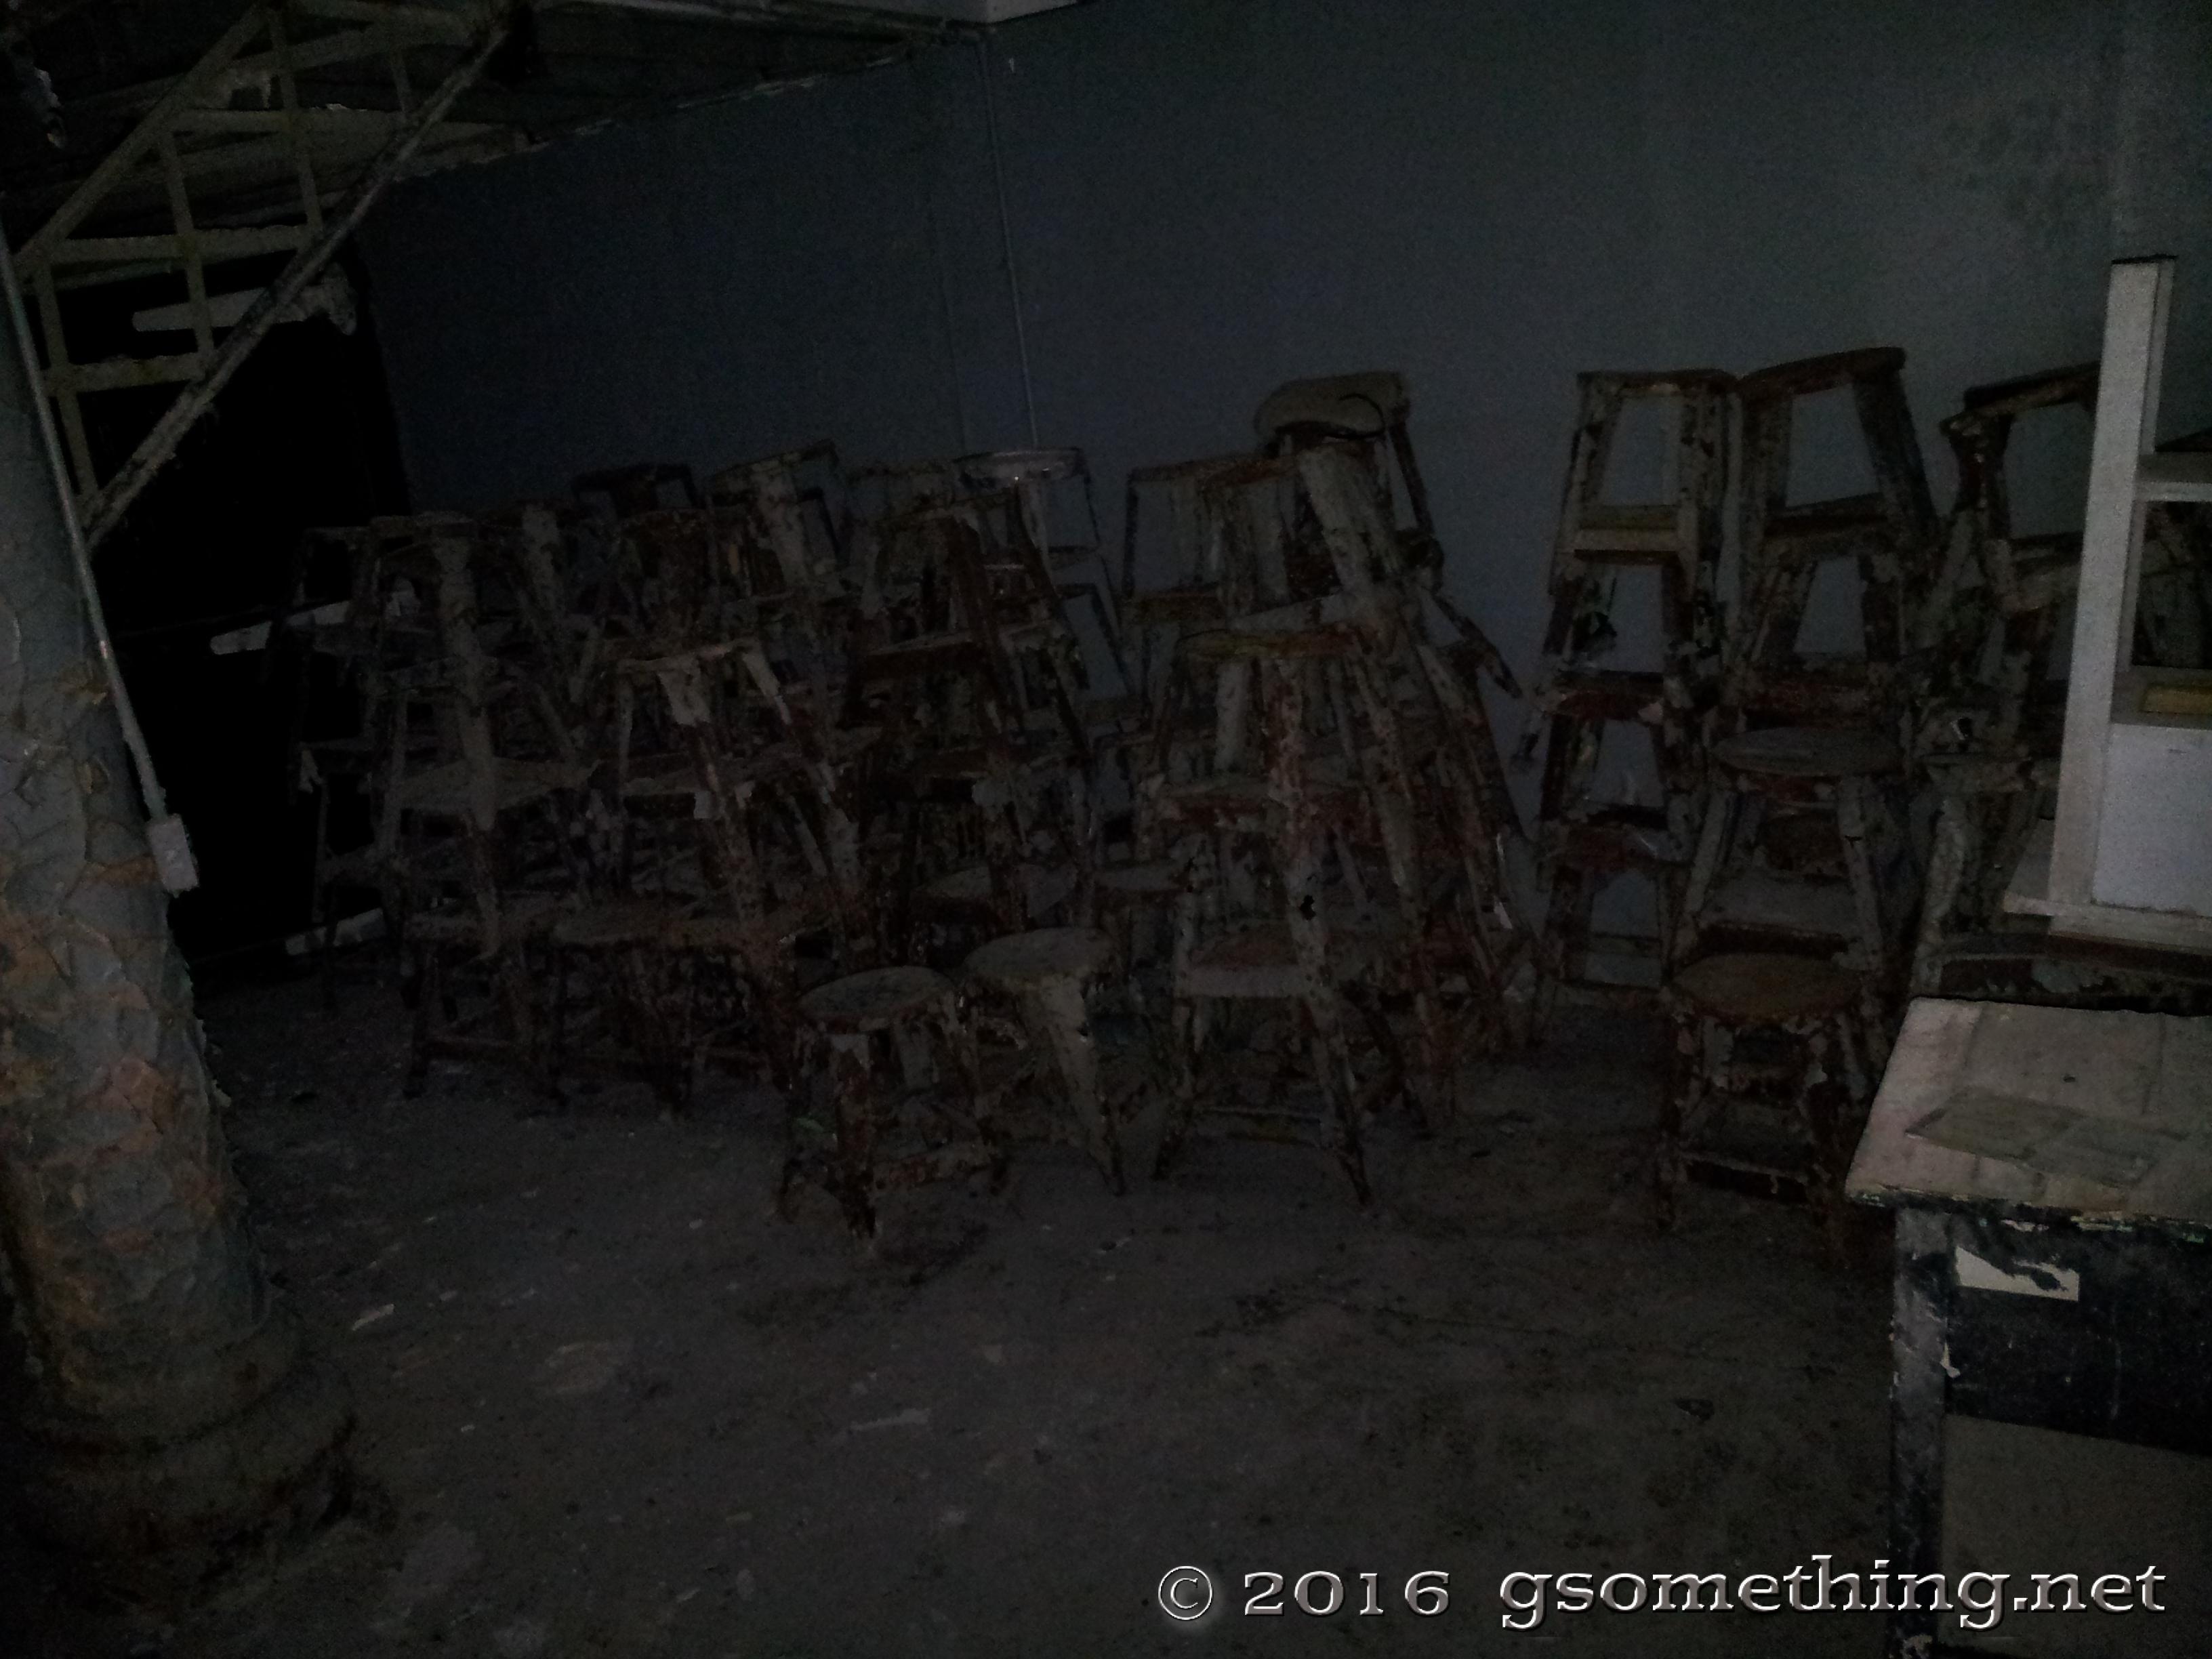 mansfield_reformatory_1st_trip_44.jpg